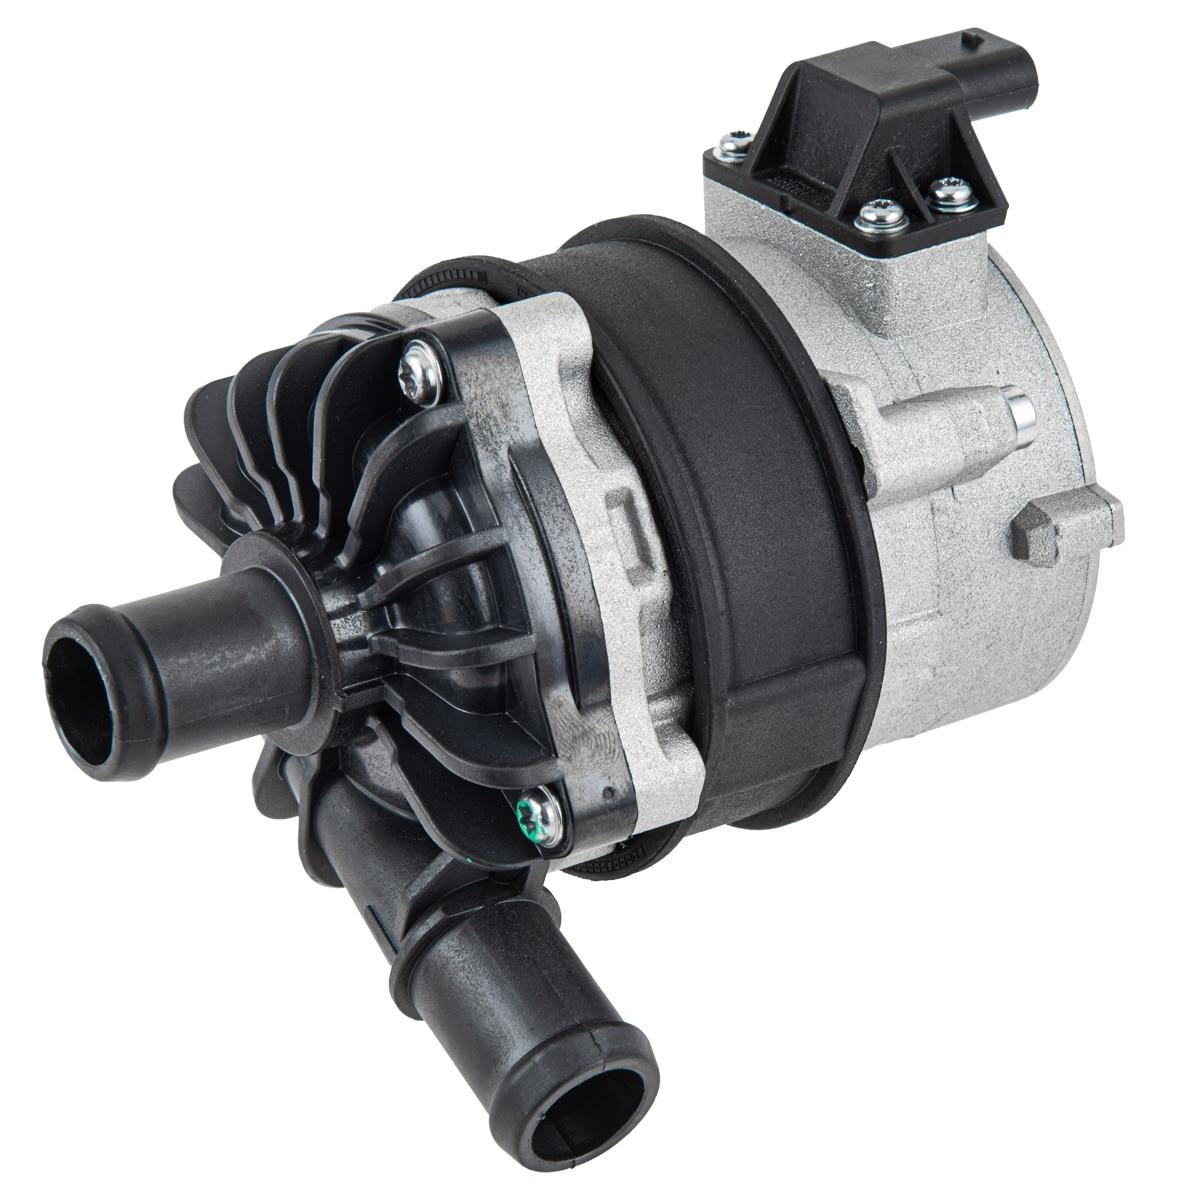 مضخة مياه مساعدة للمحرك OEM 7P0965567 لفولكس فاجن جيتا 1.4L طوارق 3.0L بورش كايين 958 باناميرا 970 95860656700